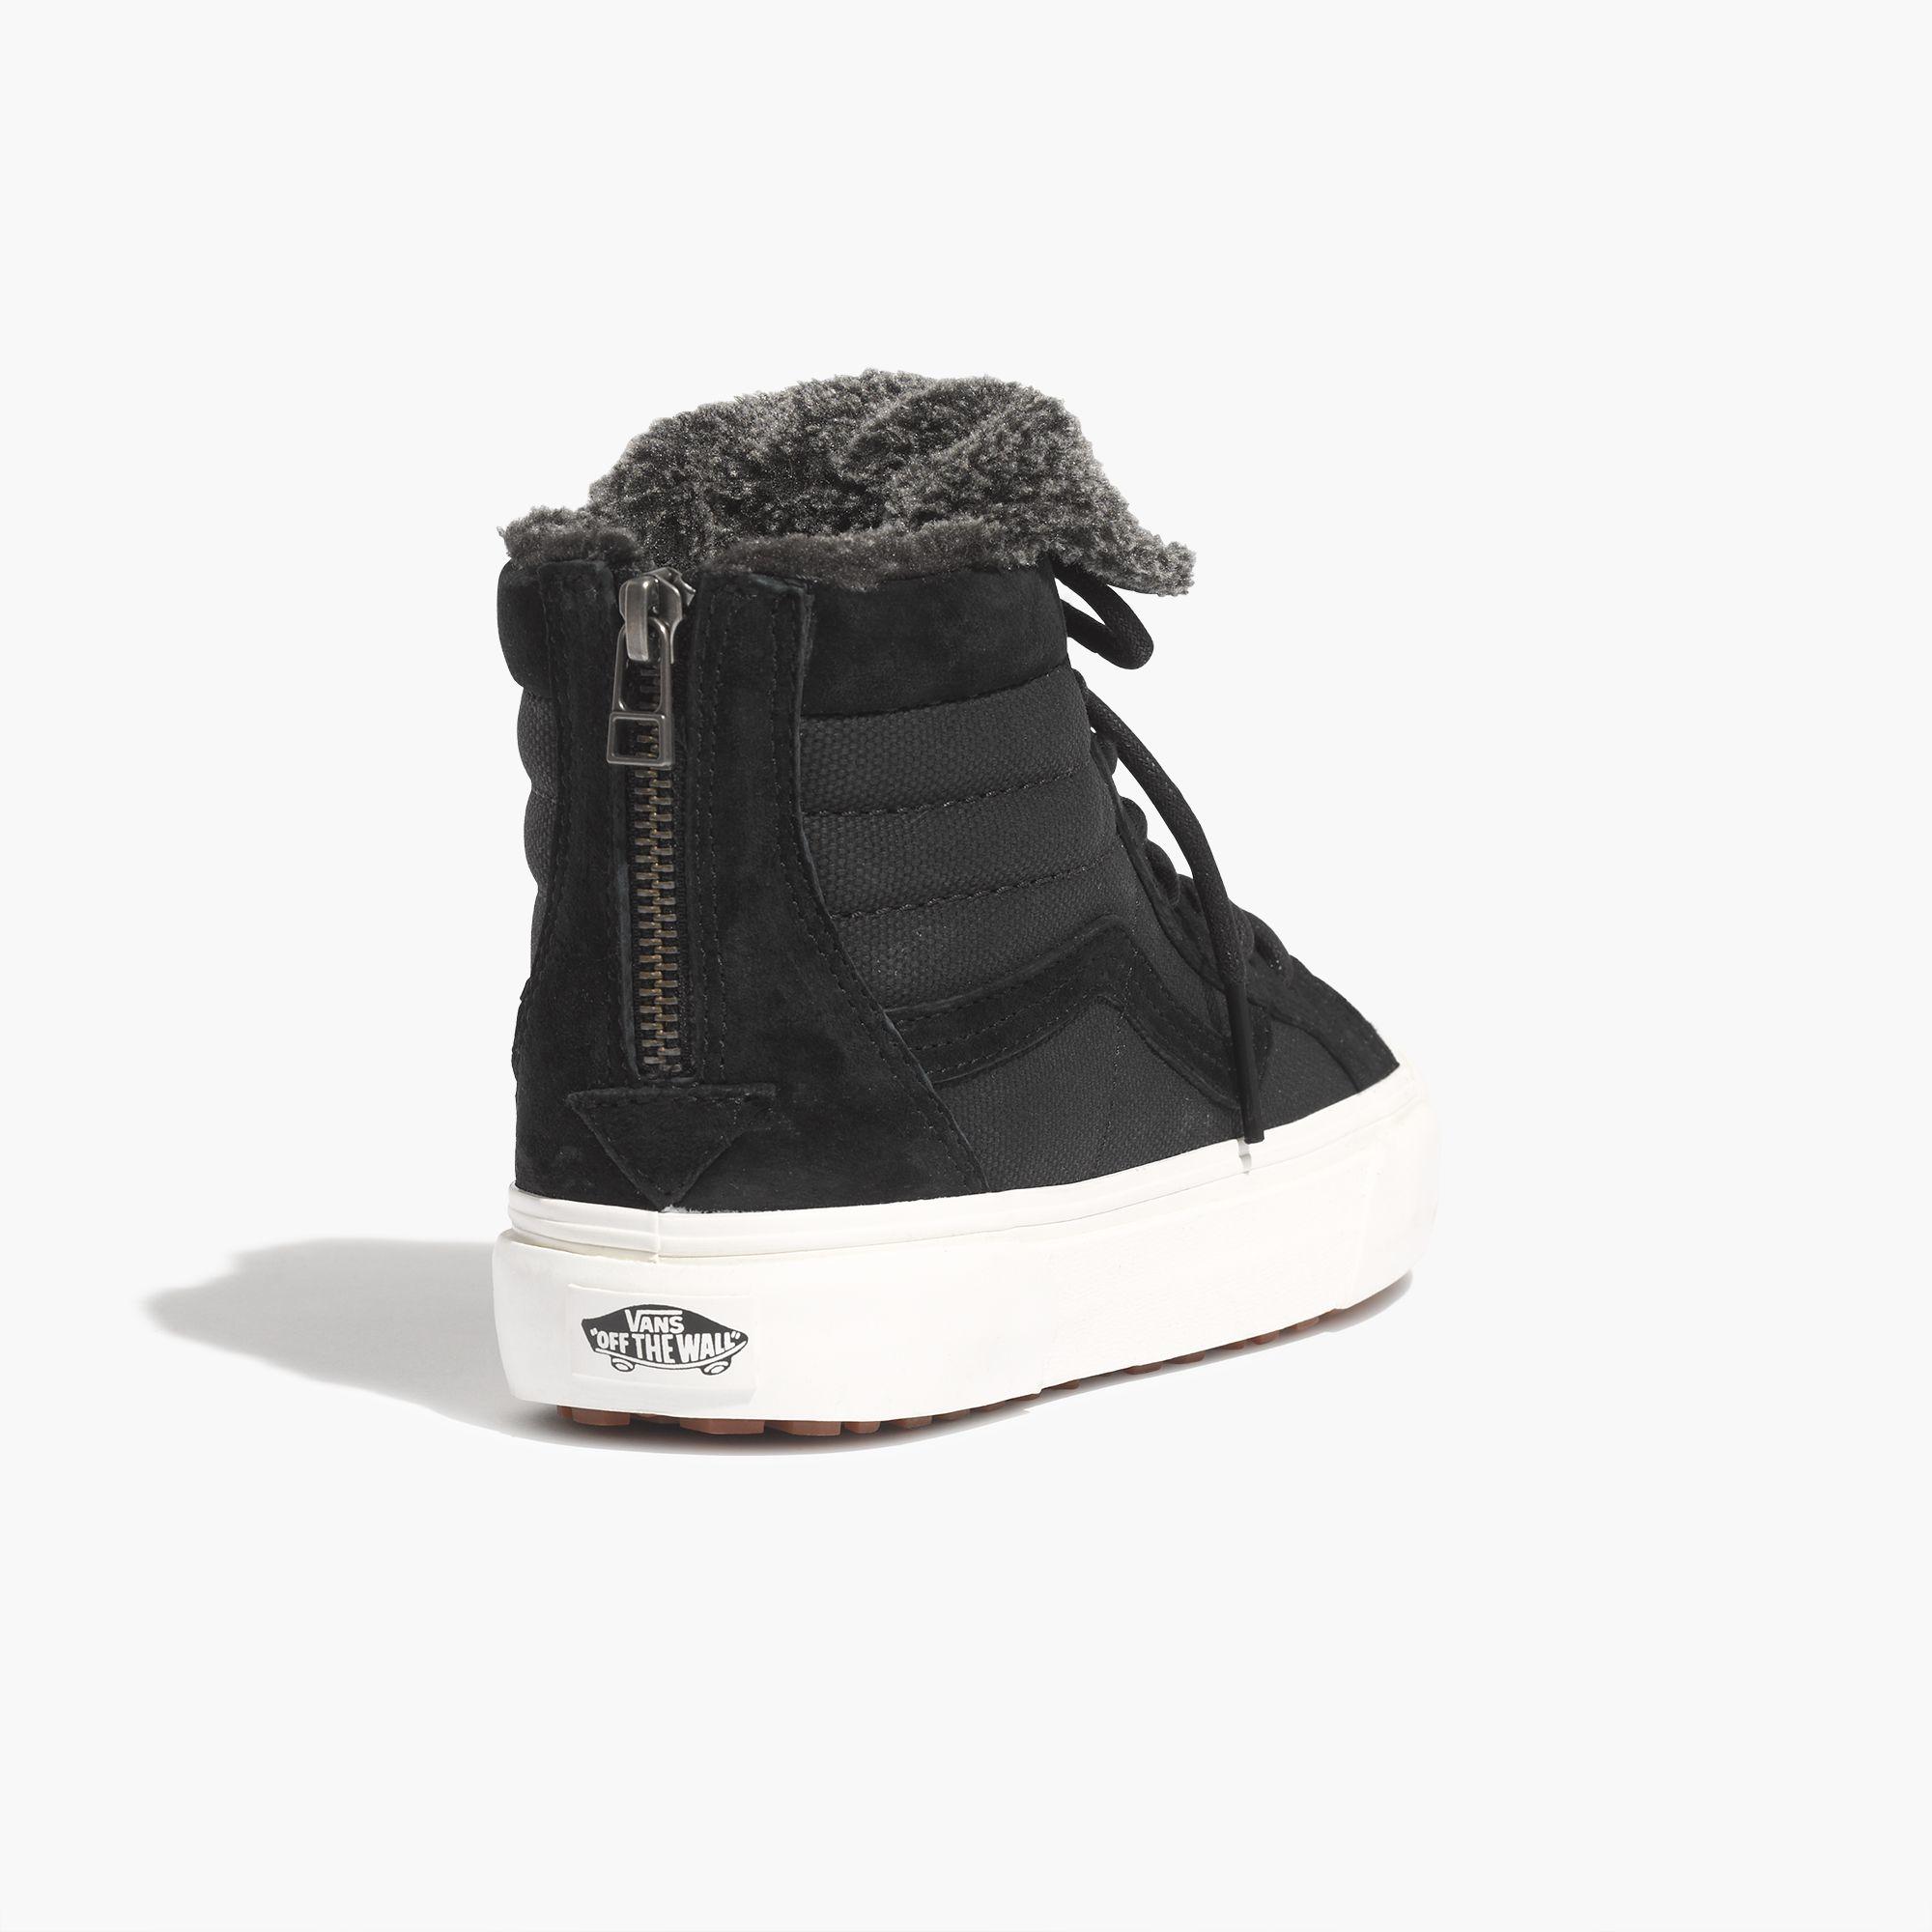 Lyst - Madewell Vans® Sk8-hi Slim Zip High-top Sneakers In Fleece in Black bdbb7cc66